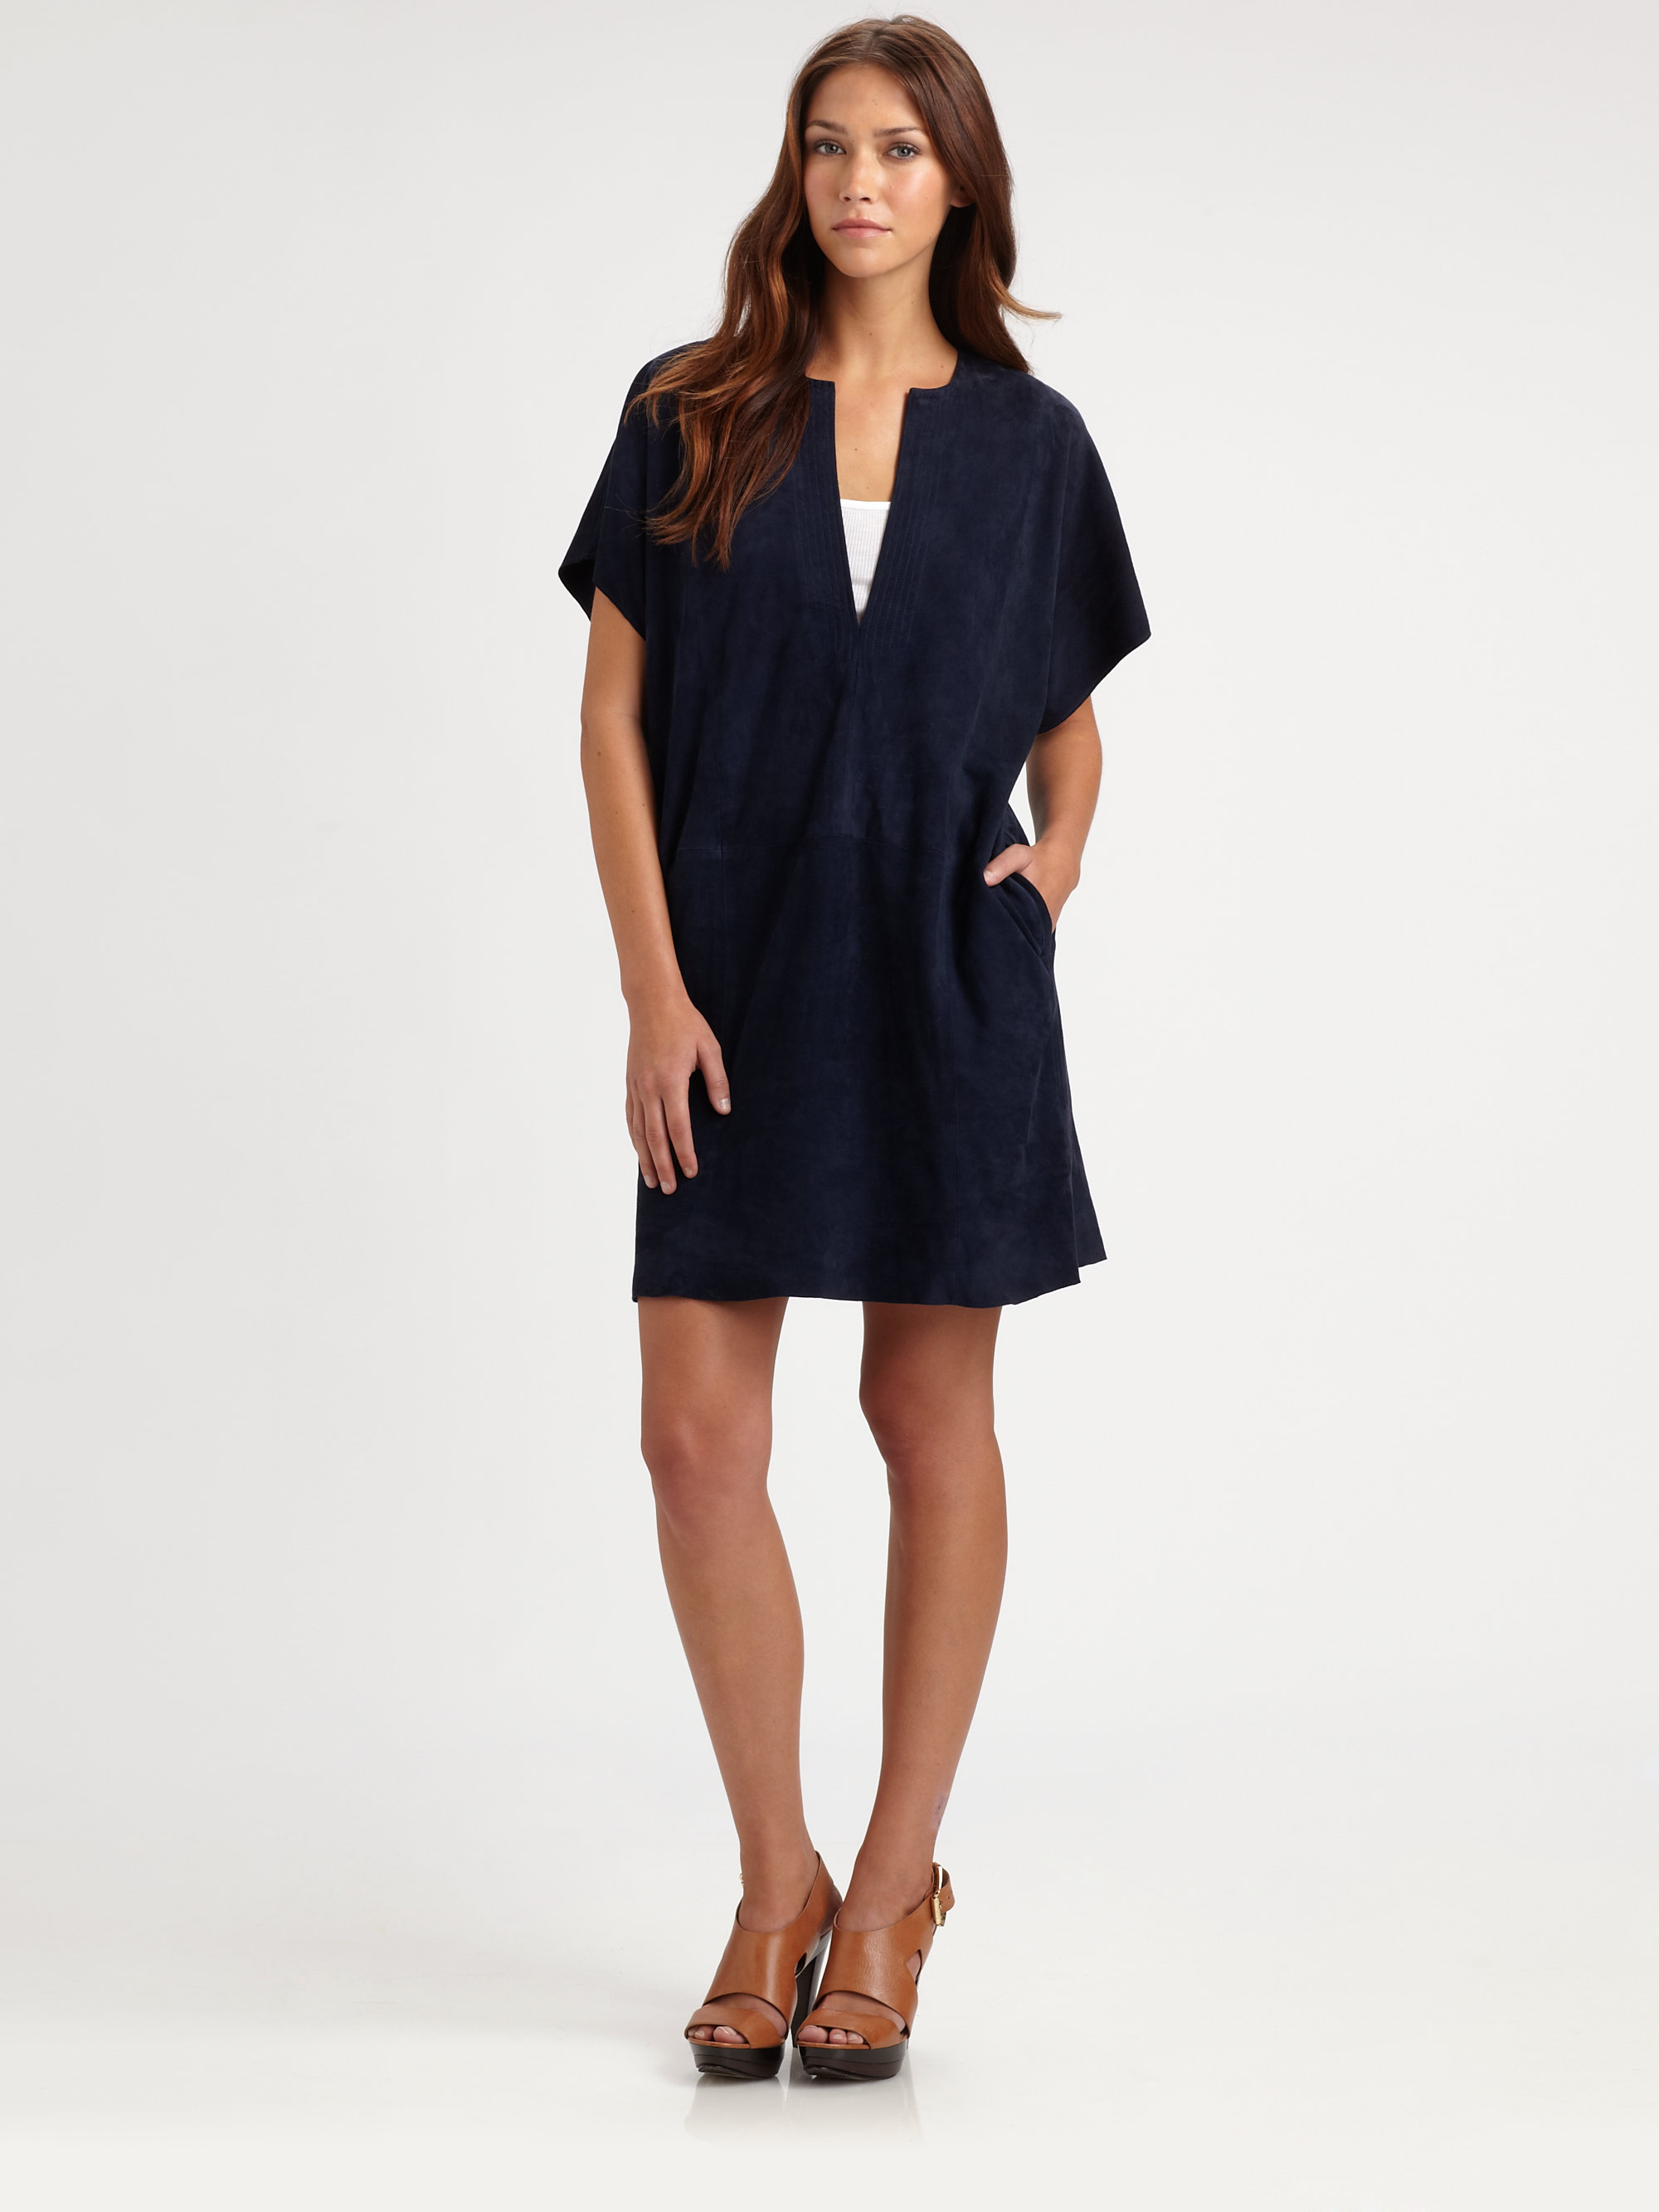 Navy Blue Tunic Dress